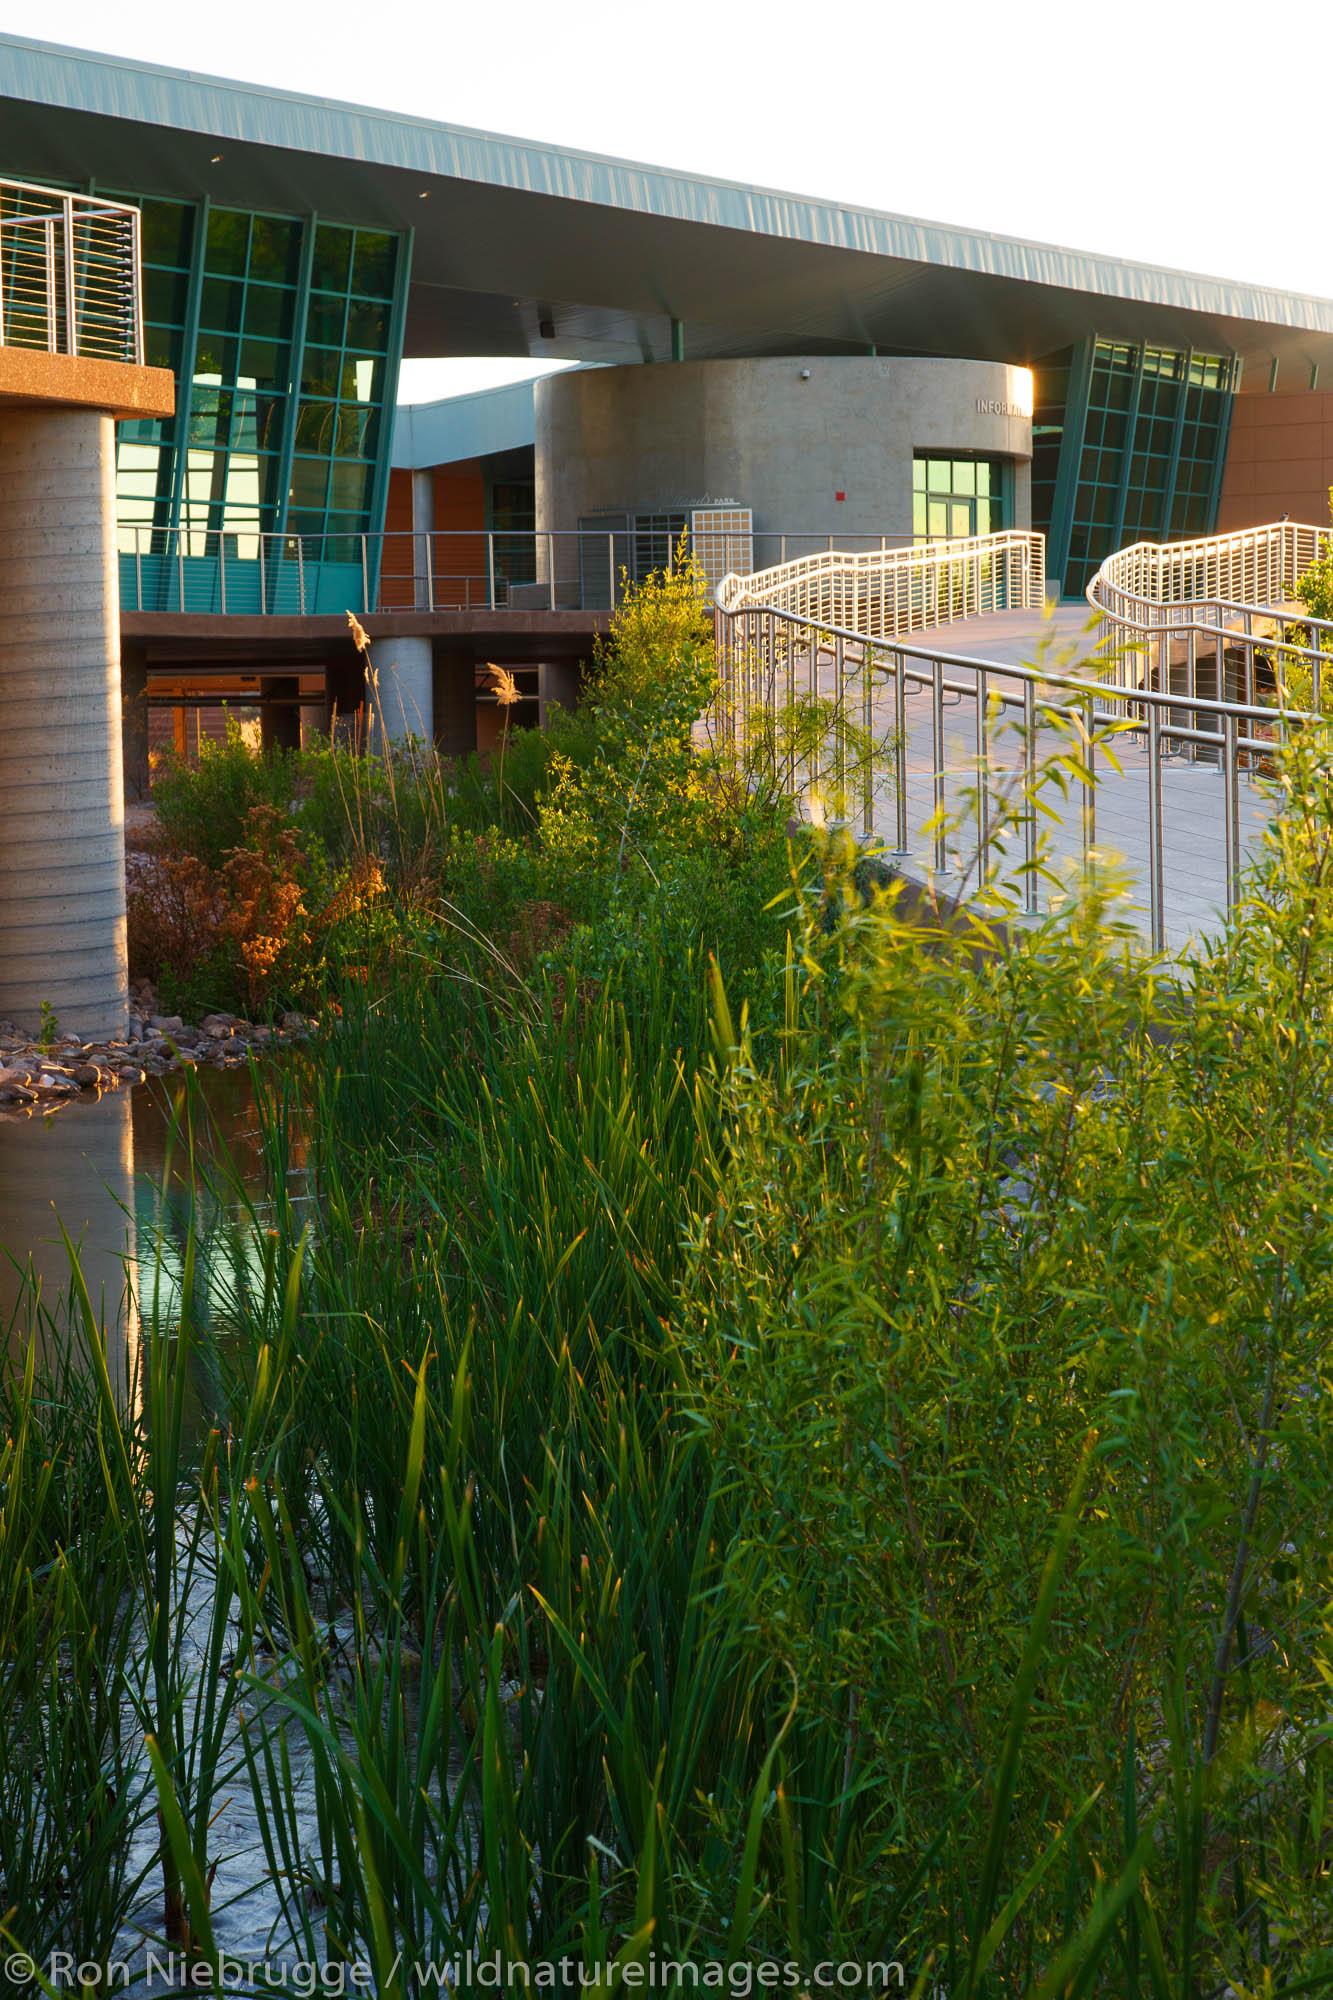 Clark County Wetlands Park Nature Preserve and Nature Center near Las Vegas, Nevada.